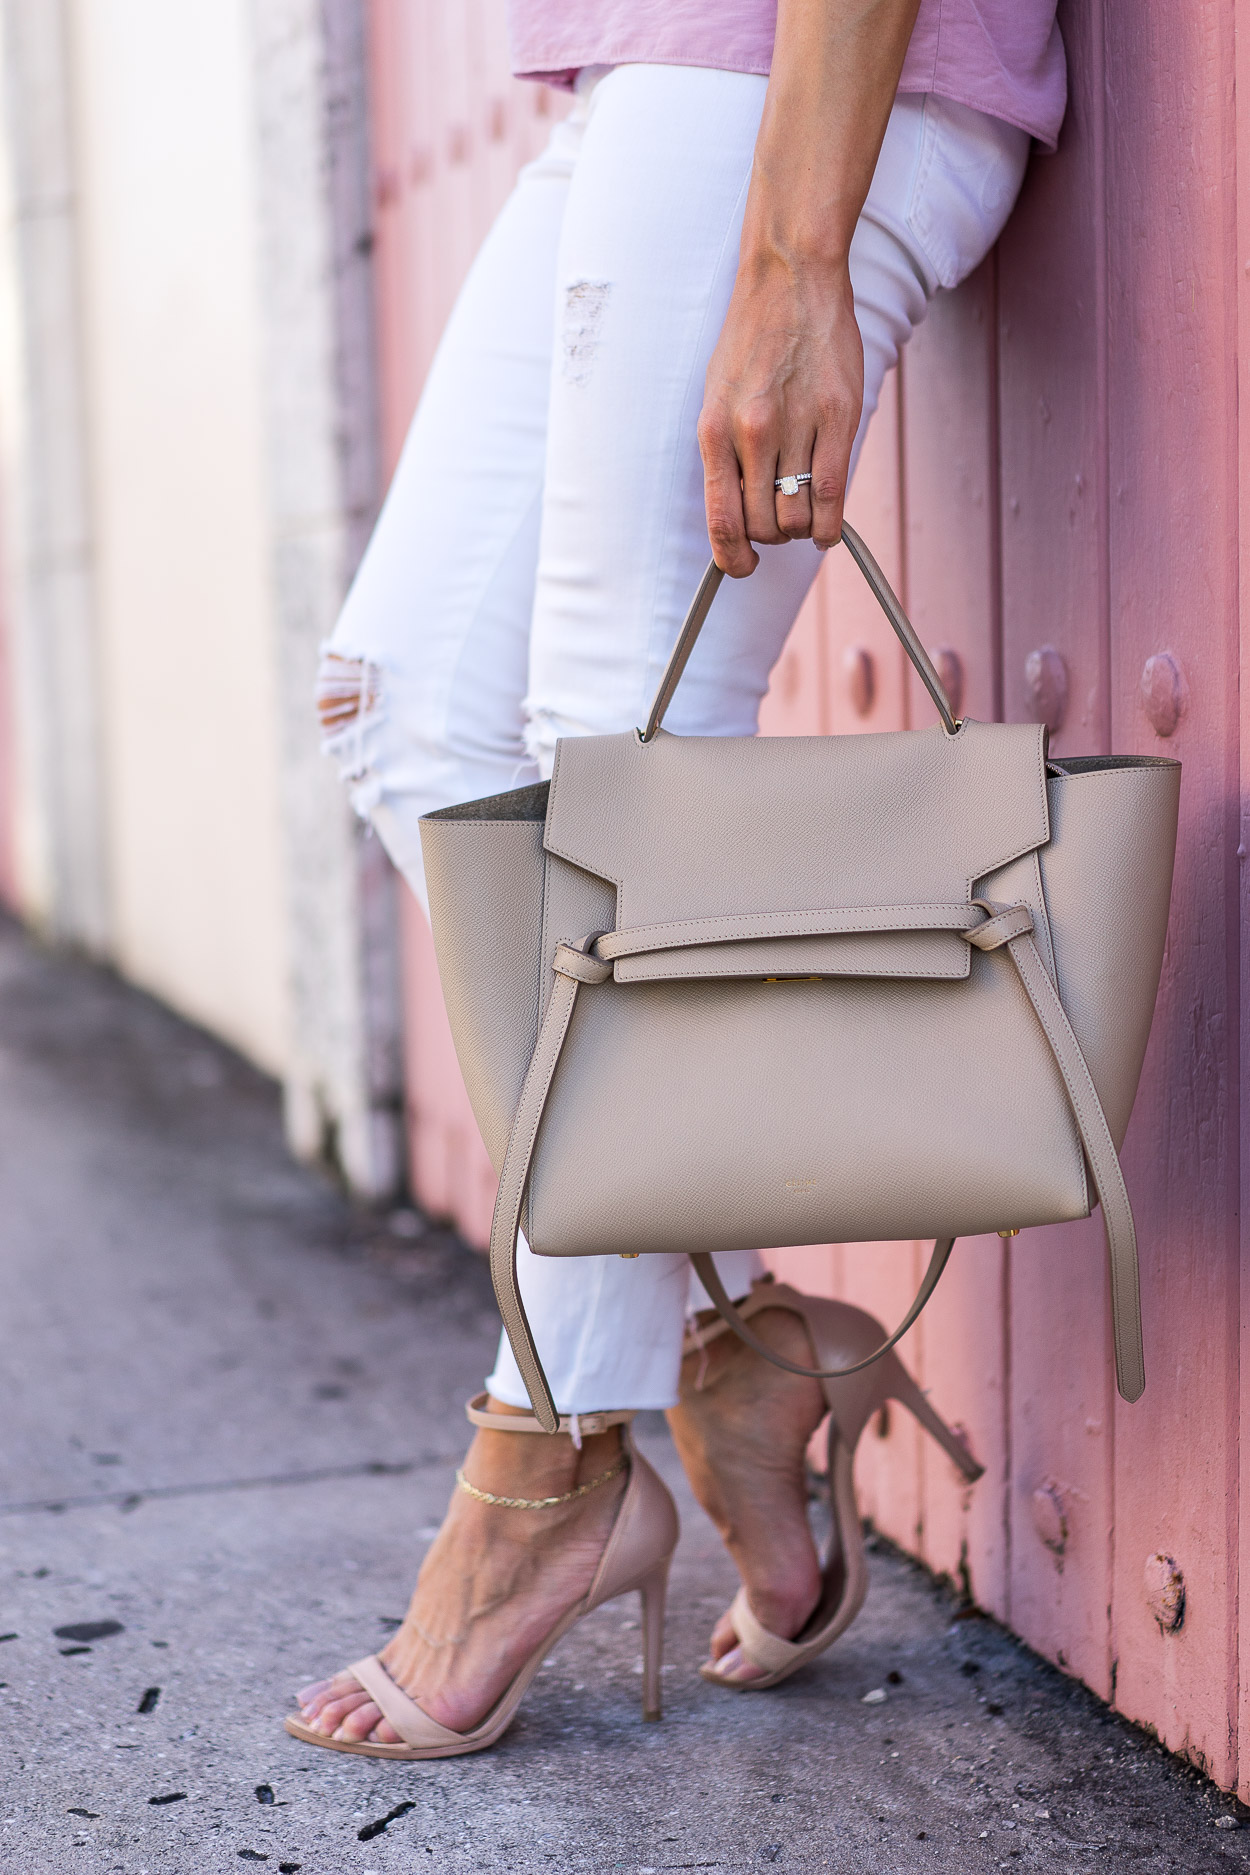 dcd4a2aec5 ... Detailed Celine Belt Bag review by Amanda of AGlamLifestyle blog